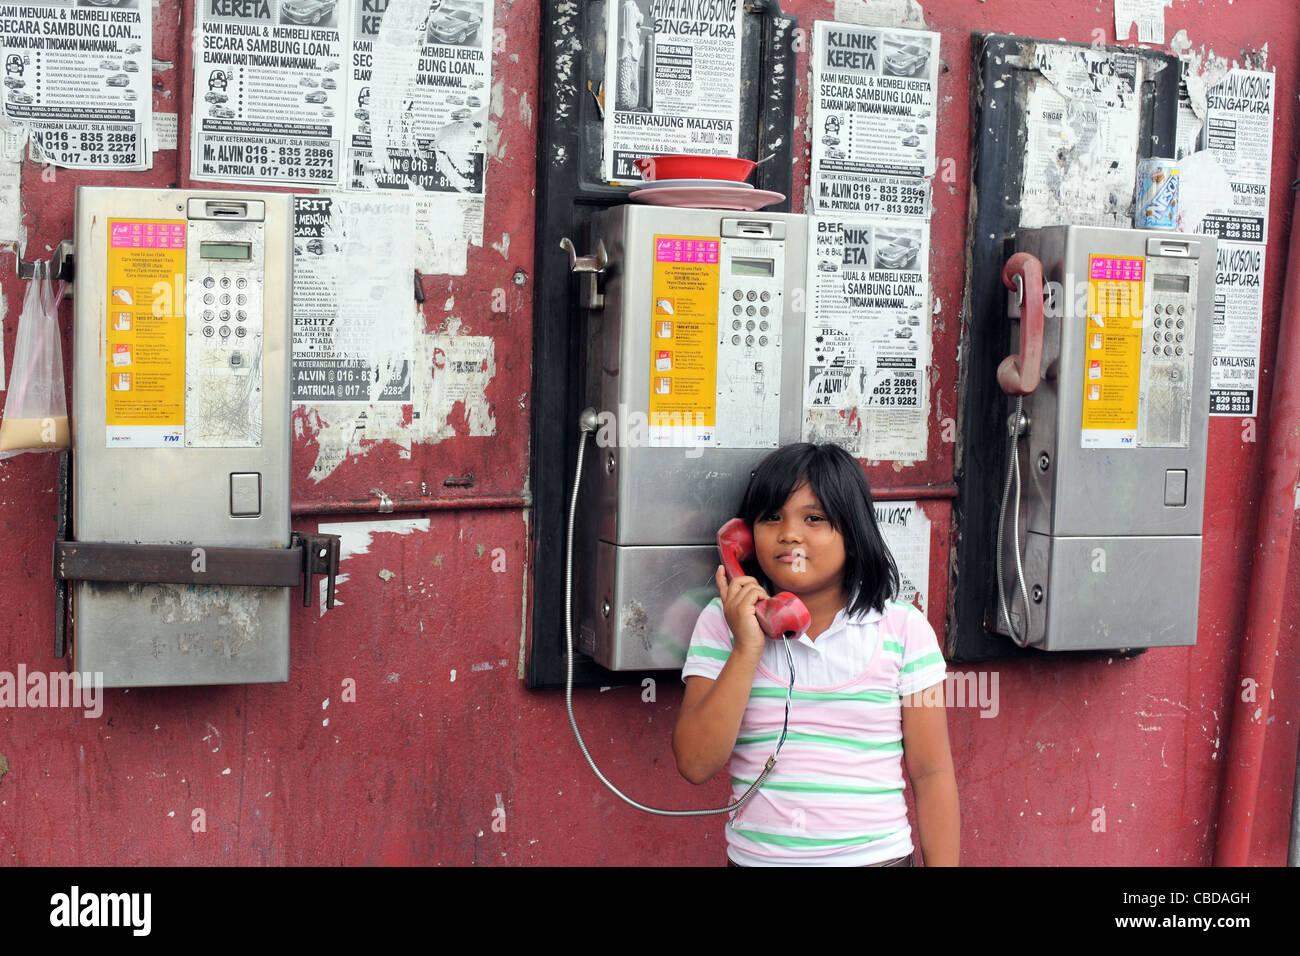 Girl talking on public telephone. Kota Kinabalu, Sabah, Borneo, Malaysia, South-East Asia, Asia - Stock Image